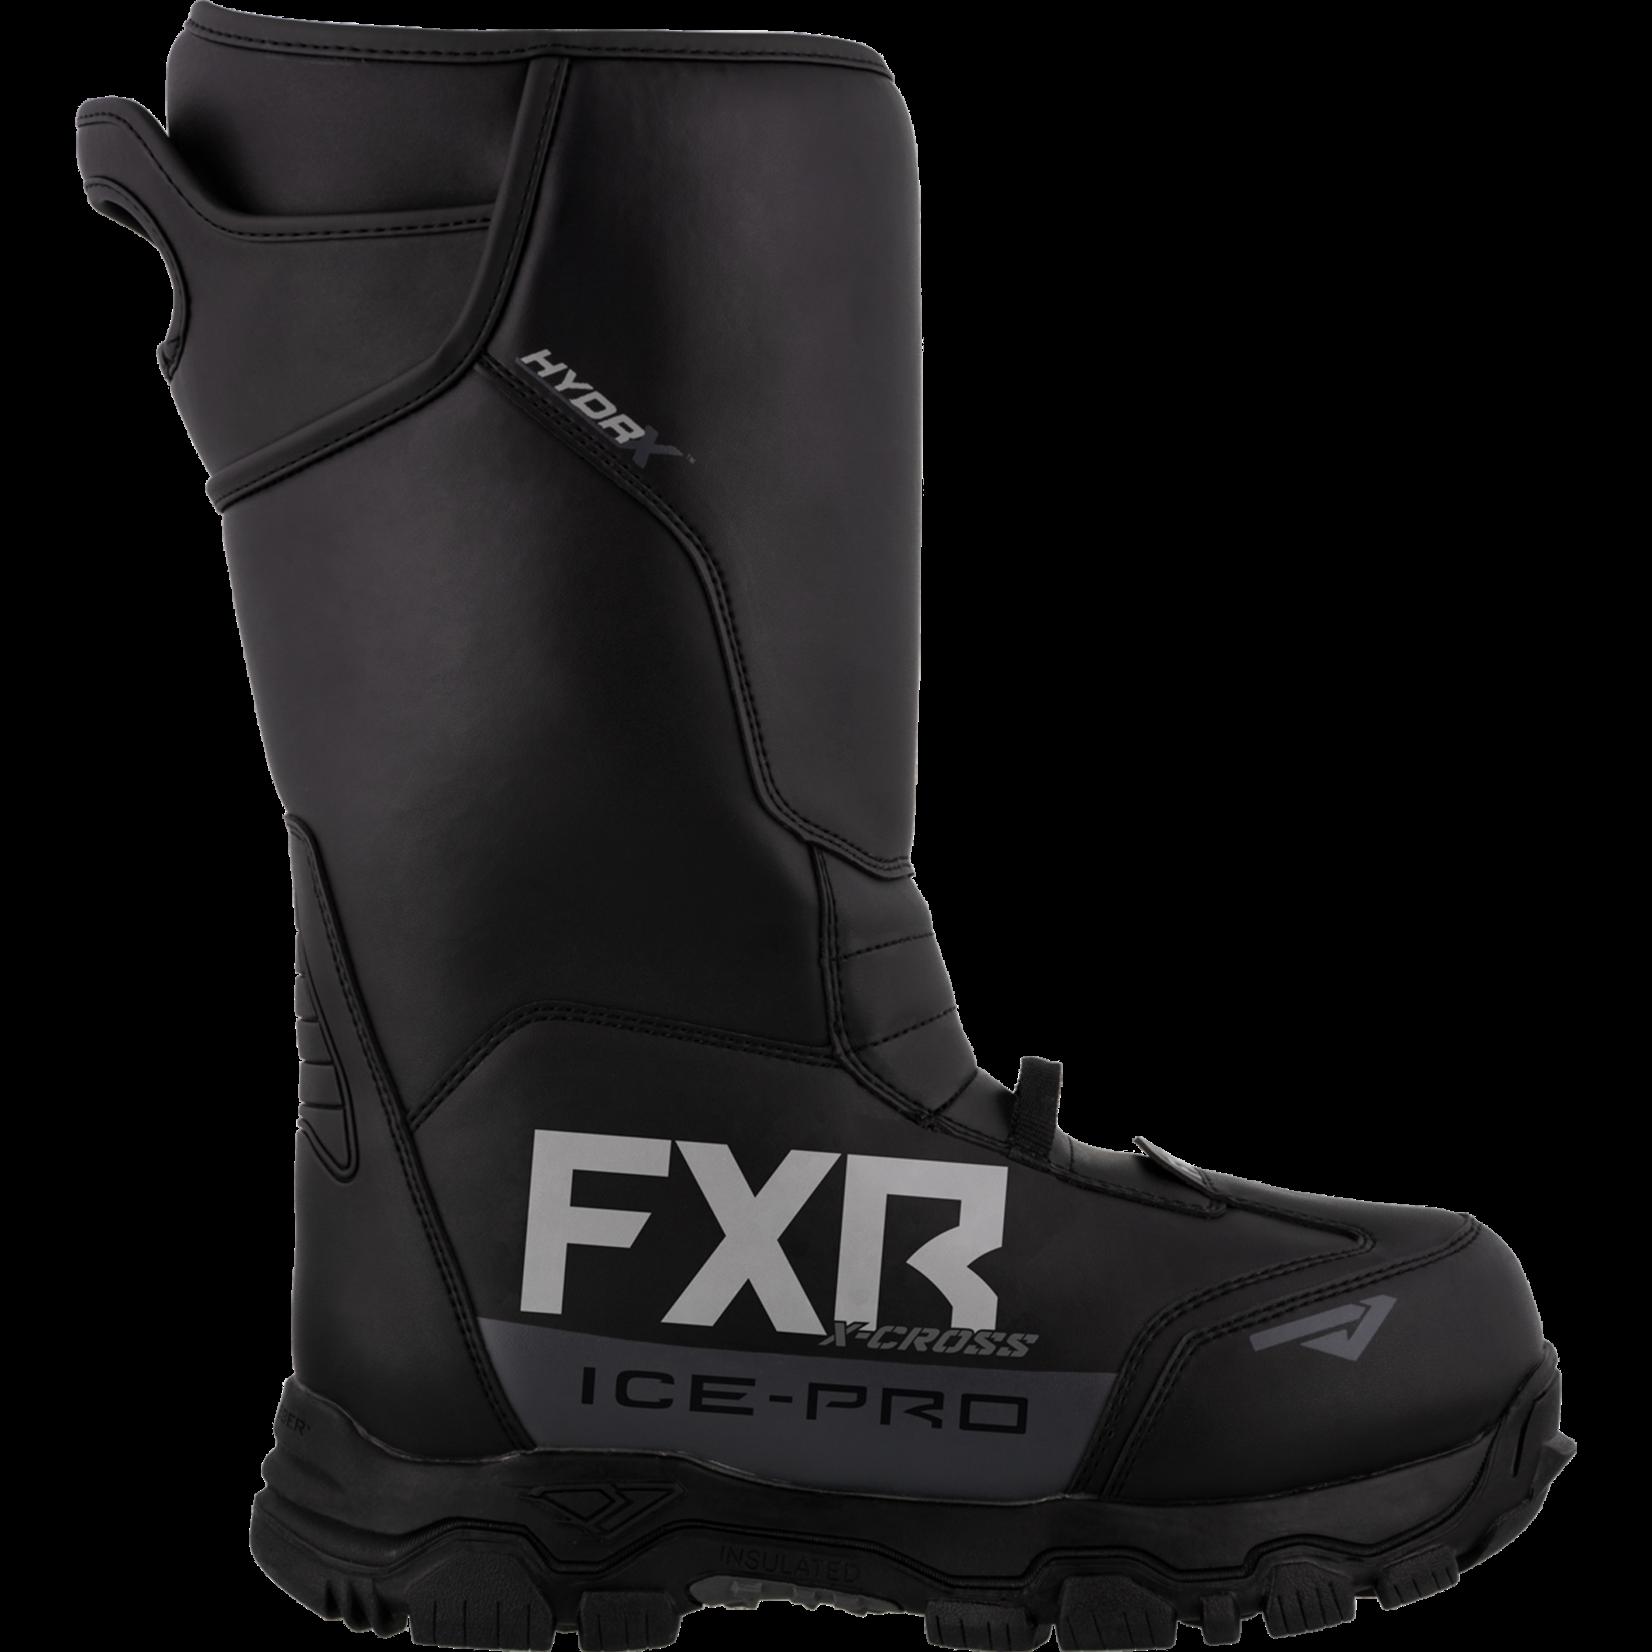 FXR FXR X-Cross Ice Pro Boot